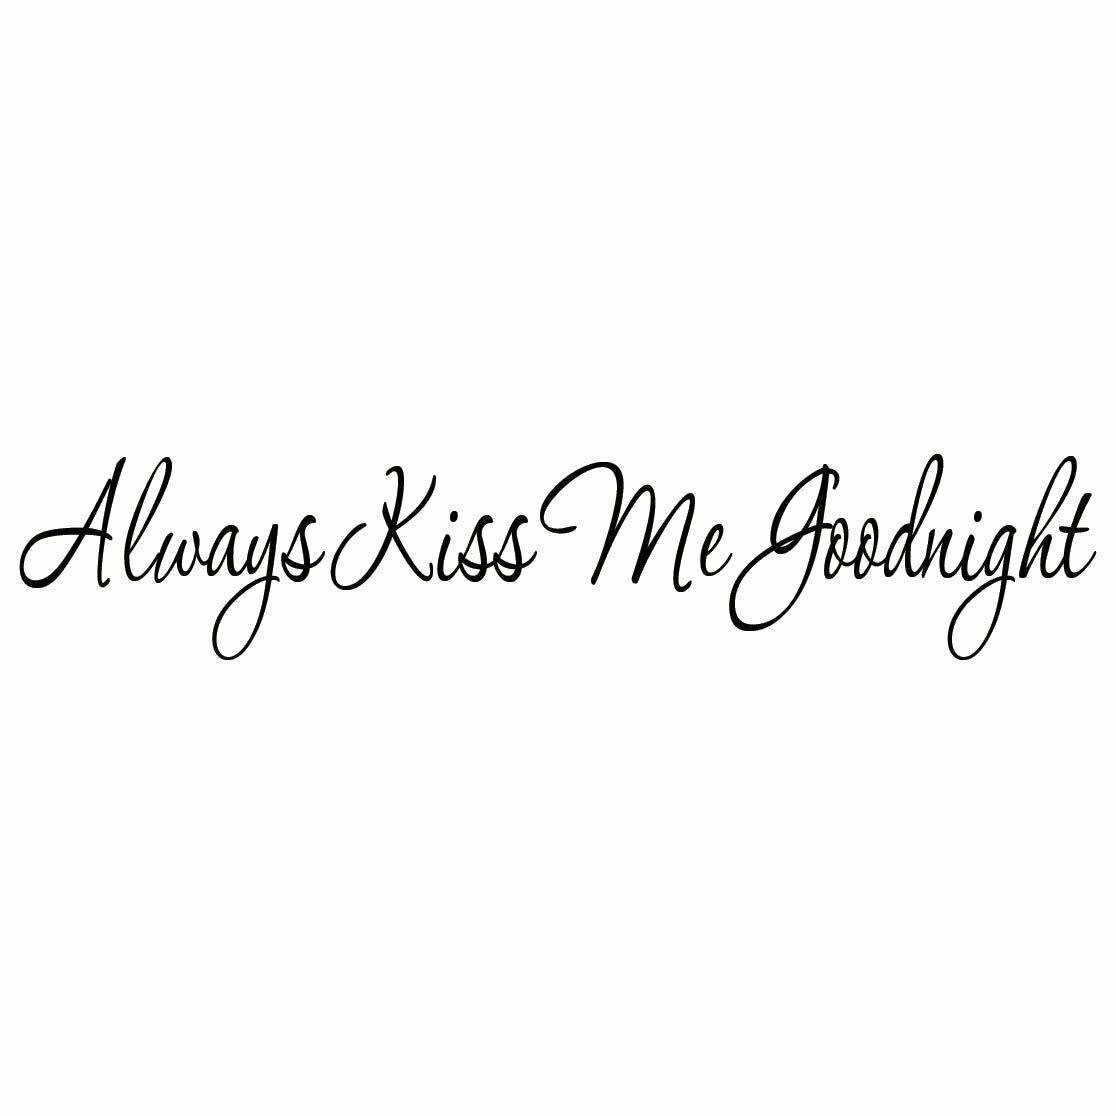 Always Kiss Me Goodnight love wife heart sticker decal logo truck car wall #285